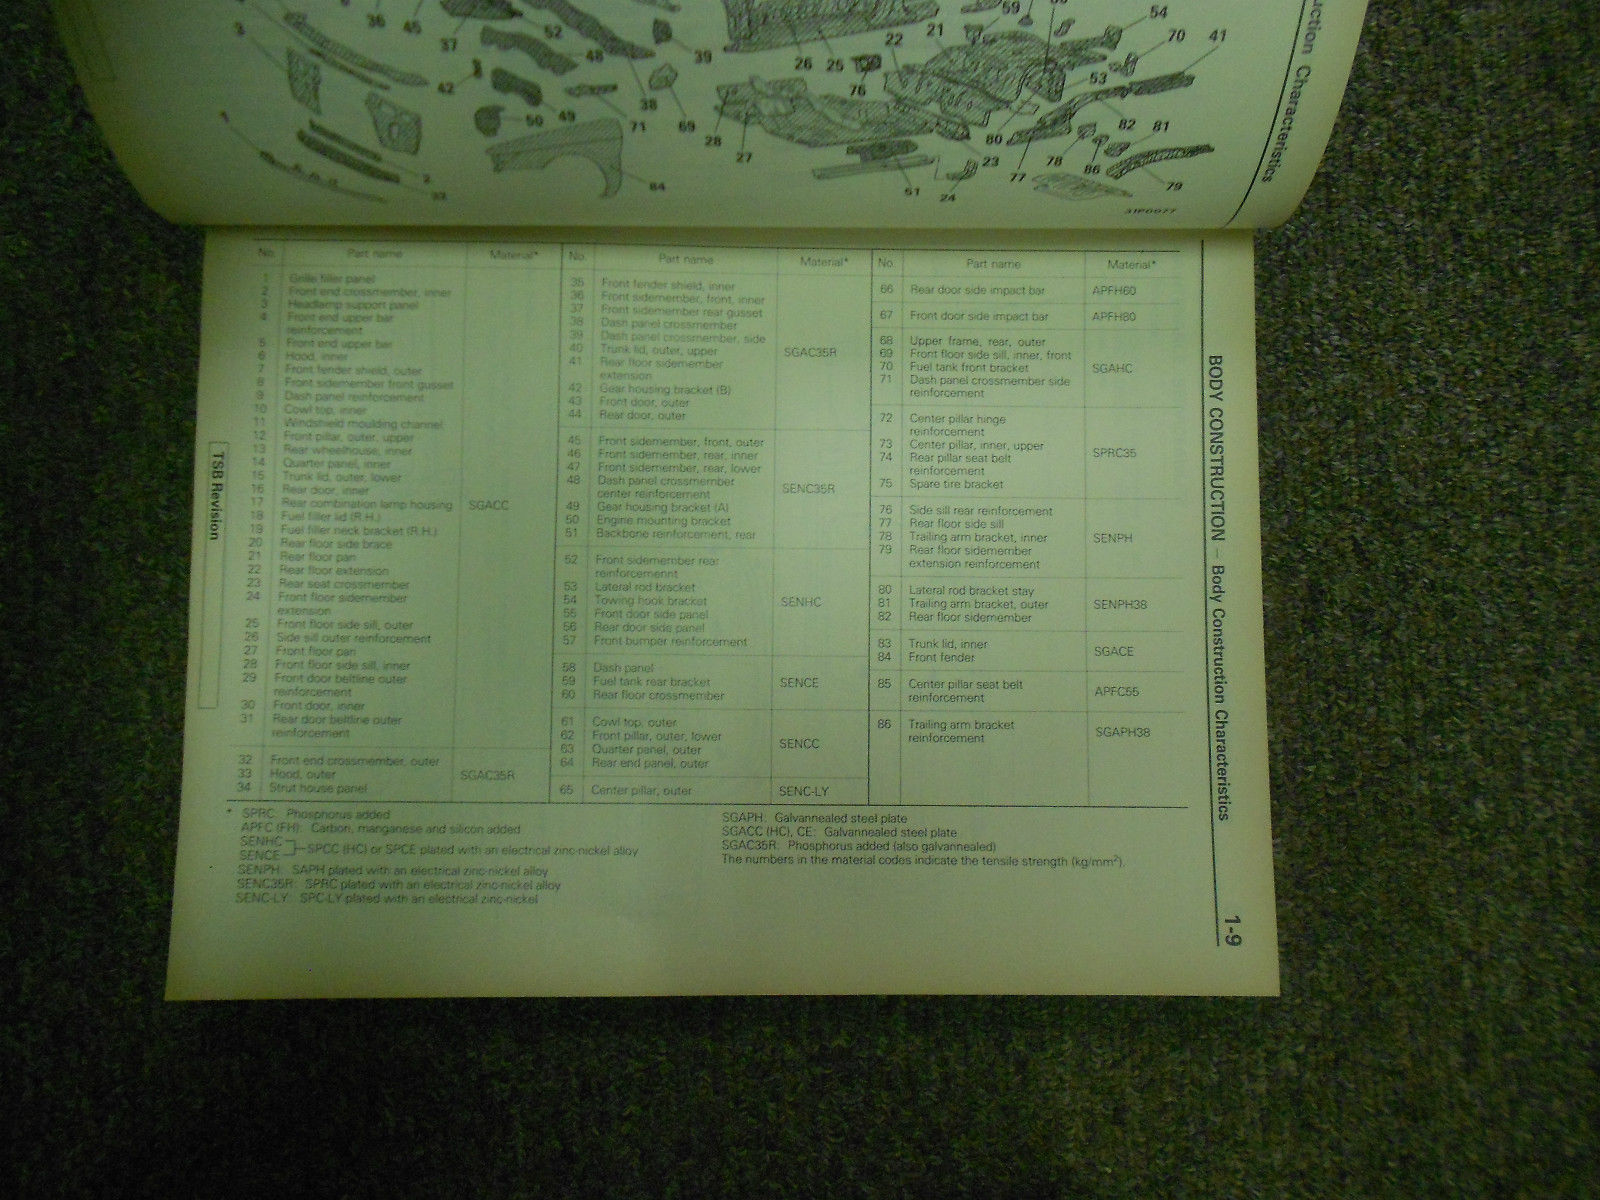 1992 MITSUBISHI Mirage Body Repair Service Shop Manual FACTORY OEM BOOK 92 DEAL